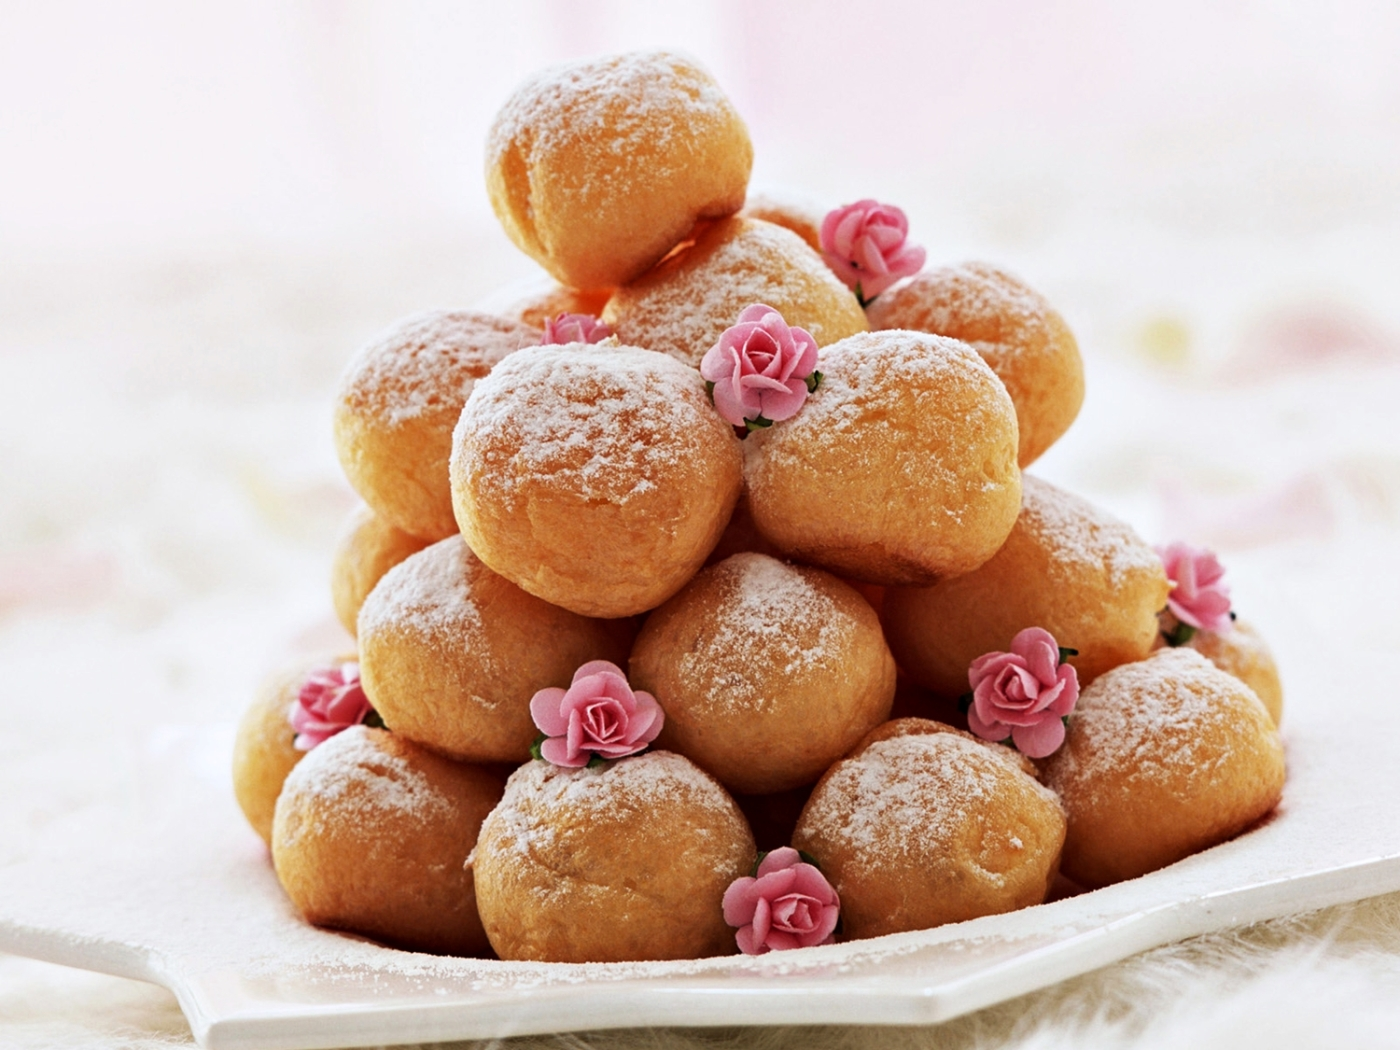 beignet, mardi gras, friture, carnaval, dessert, sucre, gourmandise, pâte briochée, beignet boule, boulange, levure